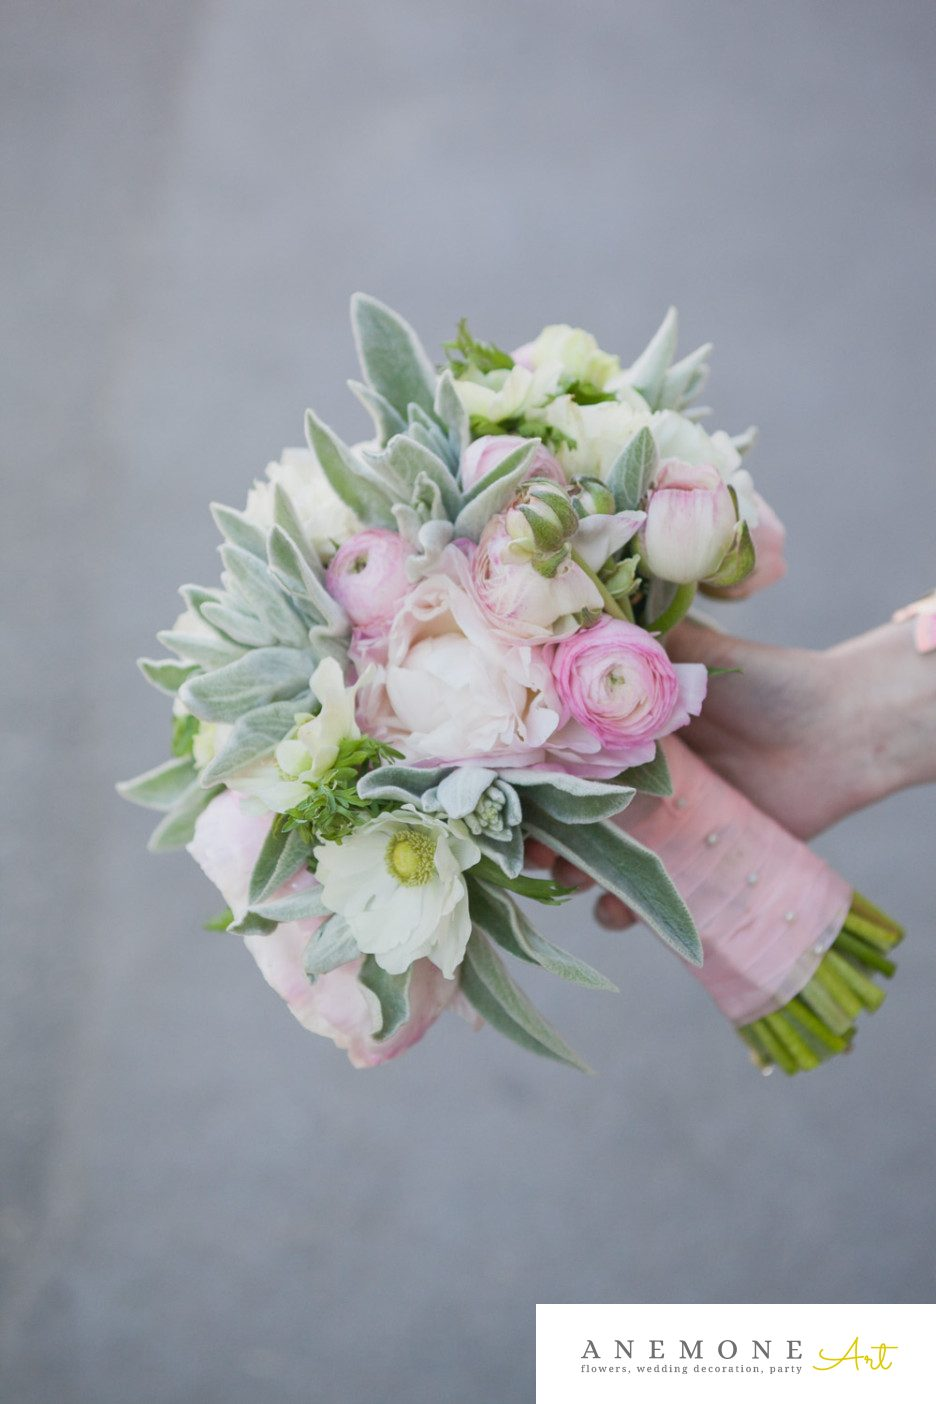 Poza, foto cu Flori de nunta anemone, buchet nasa, bujori, ranunculus, roz, verde mint in Arad, Timisoara, Oradea (wedding flowers, bouquets) nunta Arad, Timisoara, Oradea